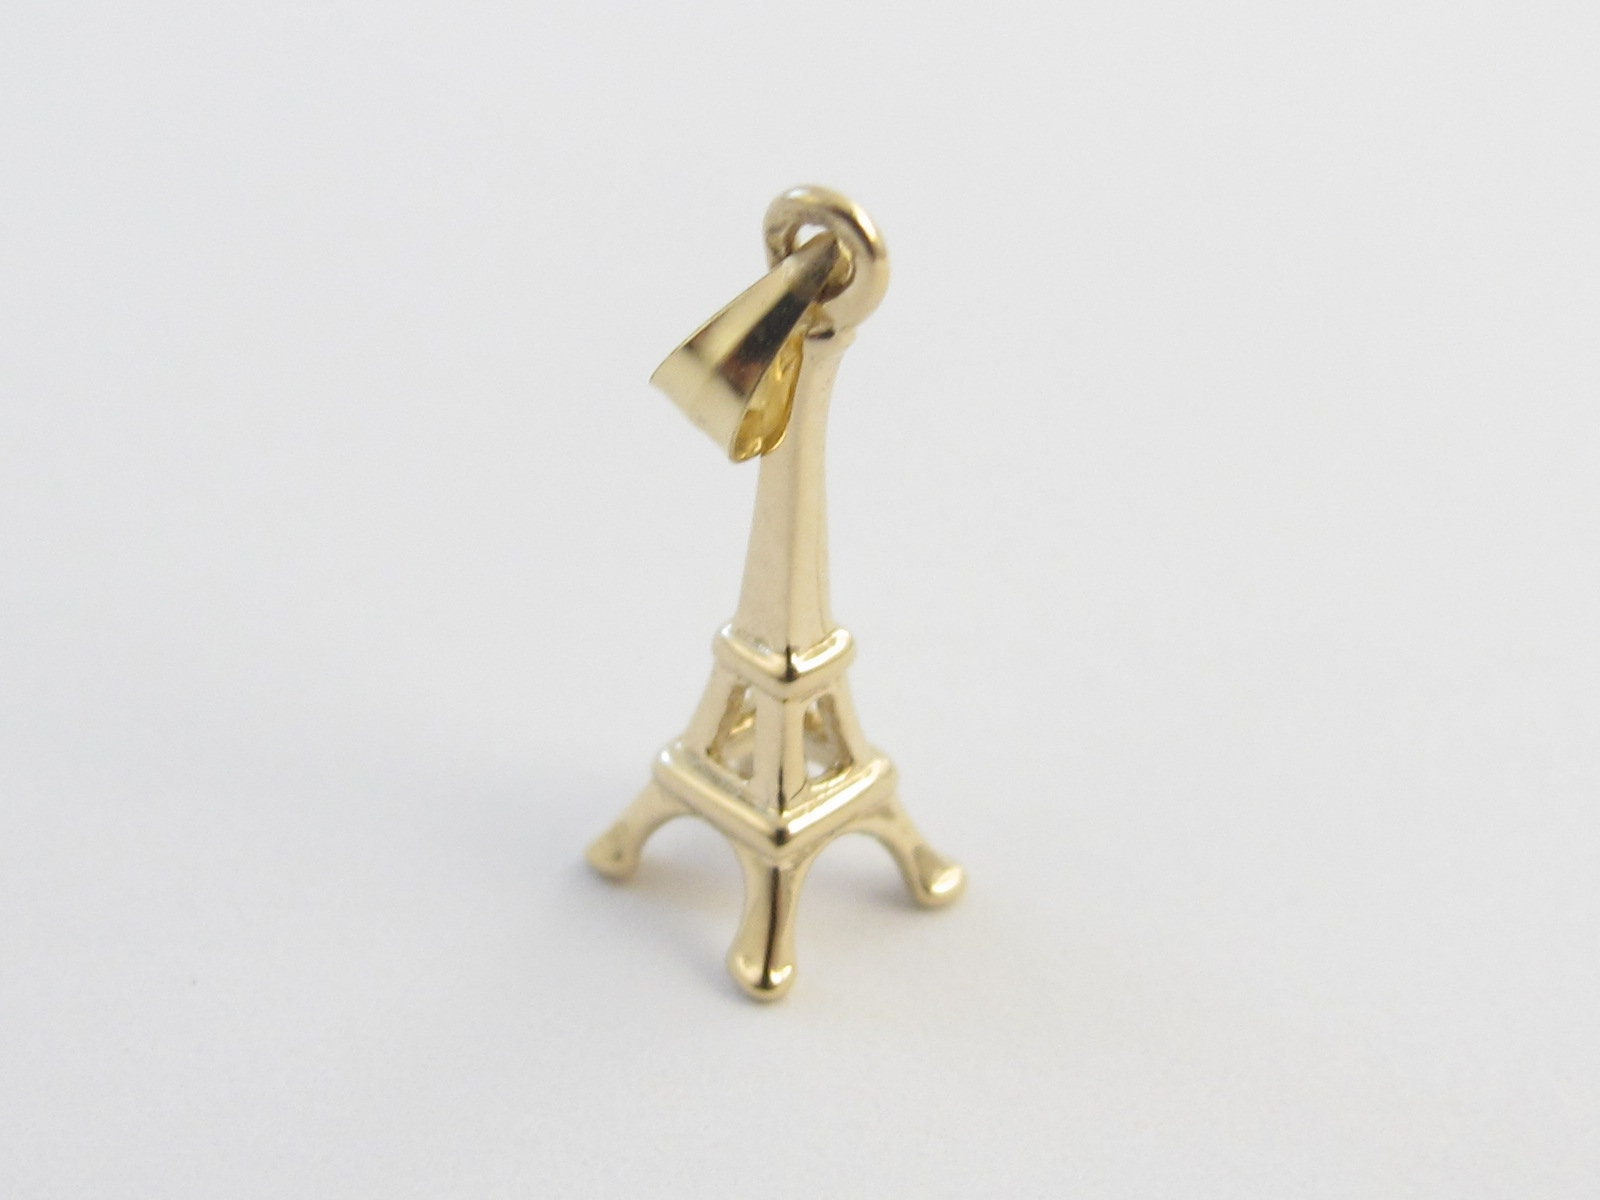 Details about  /14K Yellow Gold 3D Eiffel Tower Charm Pendant MSRP $206